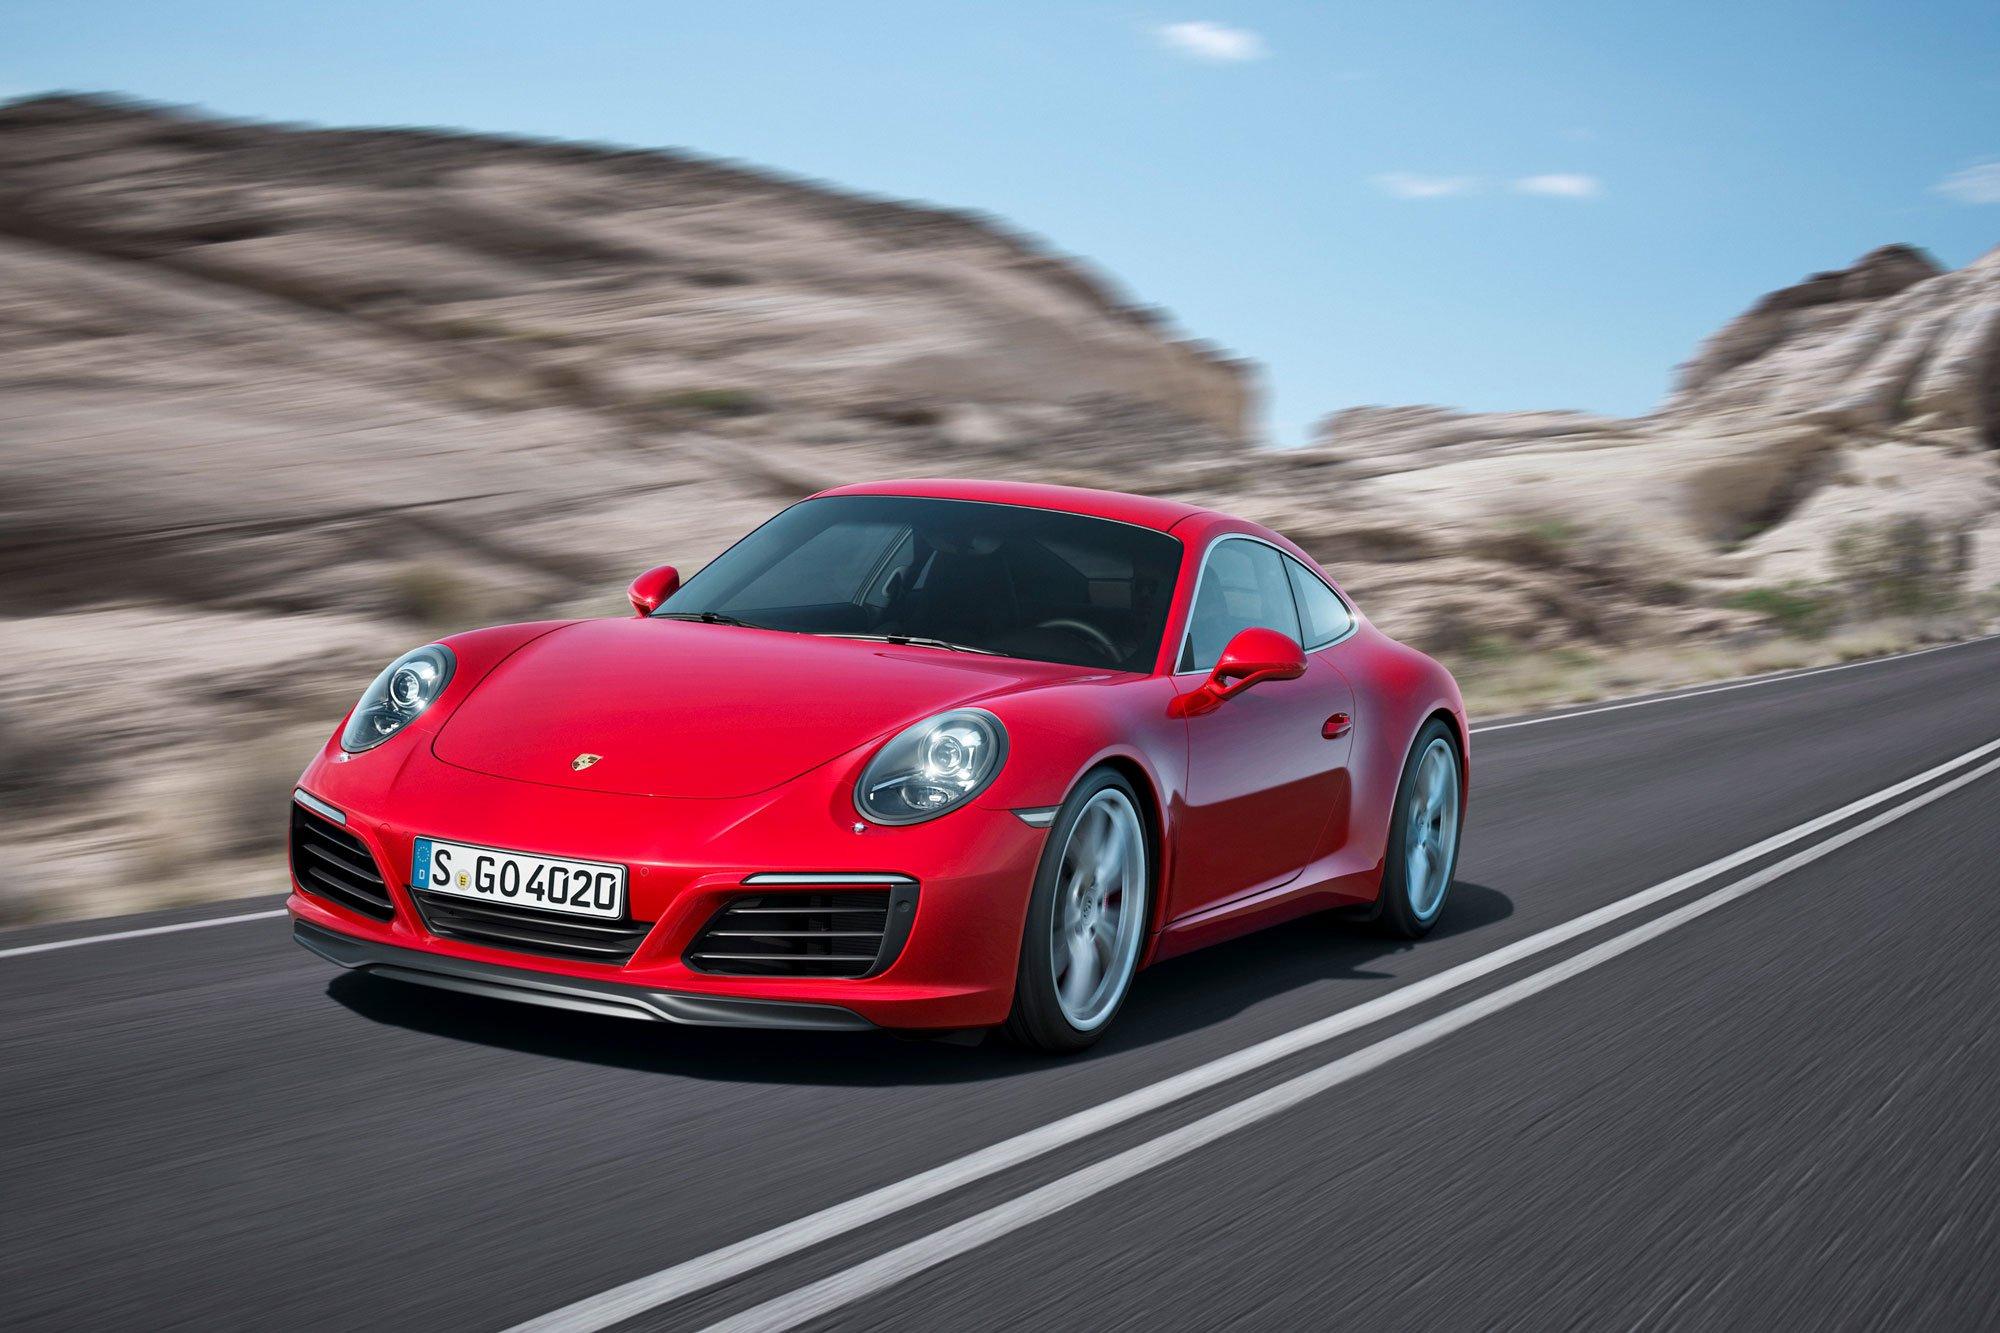 Porsche 911 mit Apple CarPlay statt Android Auto 2